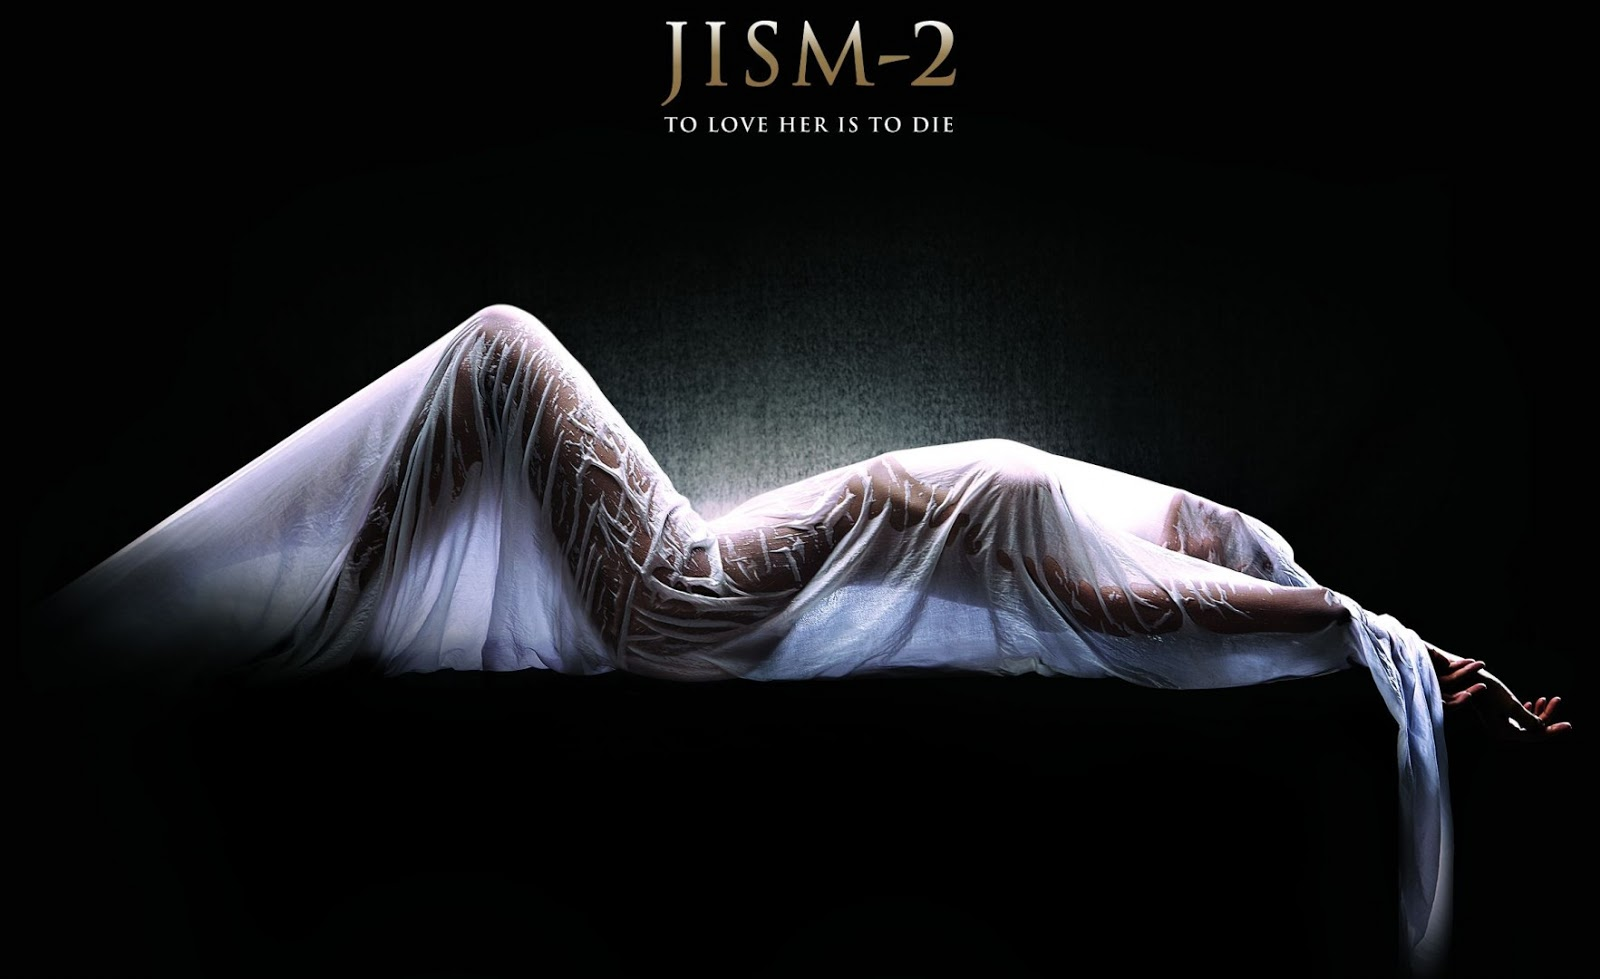 online movies soft reviews jism 2 hindi movie 2012